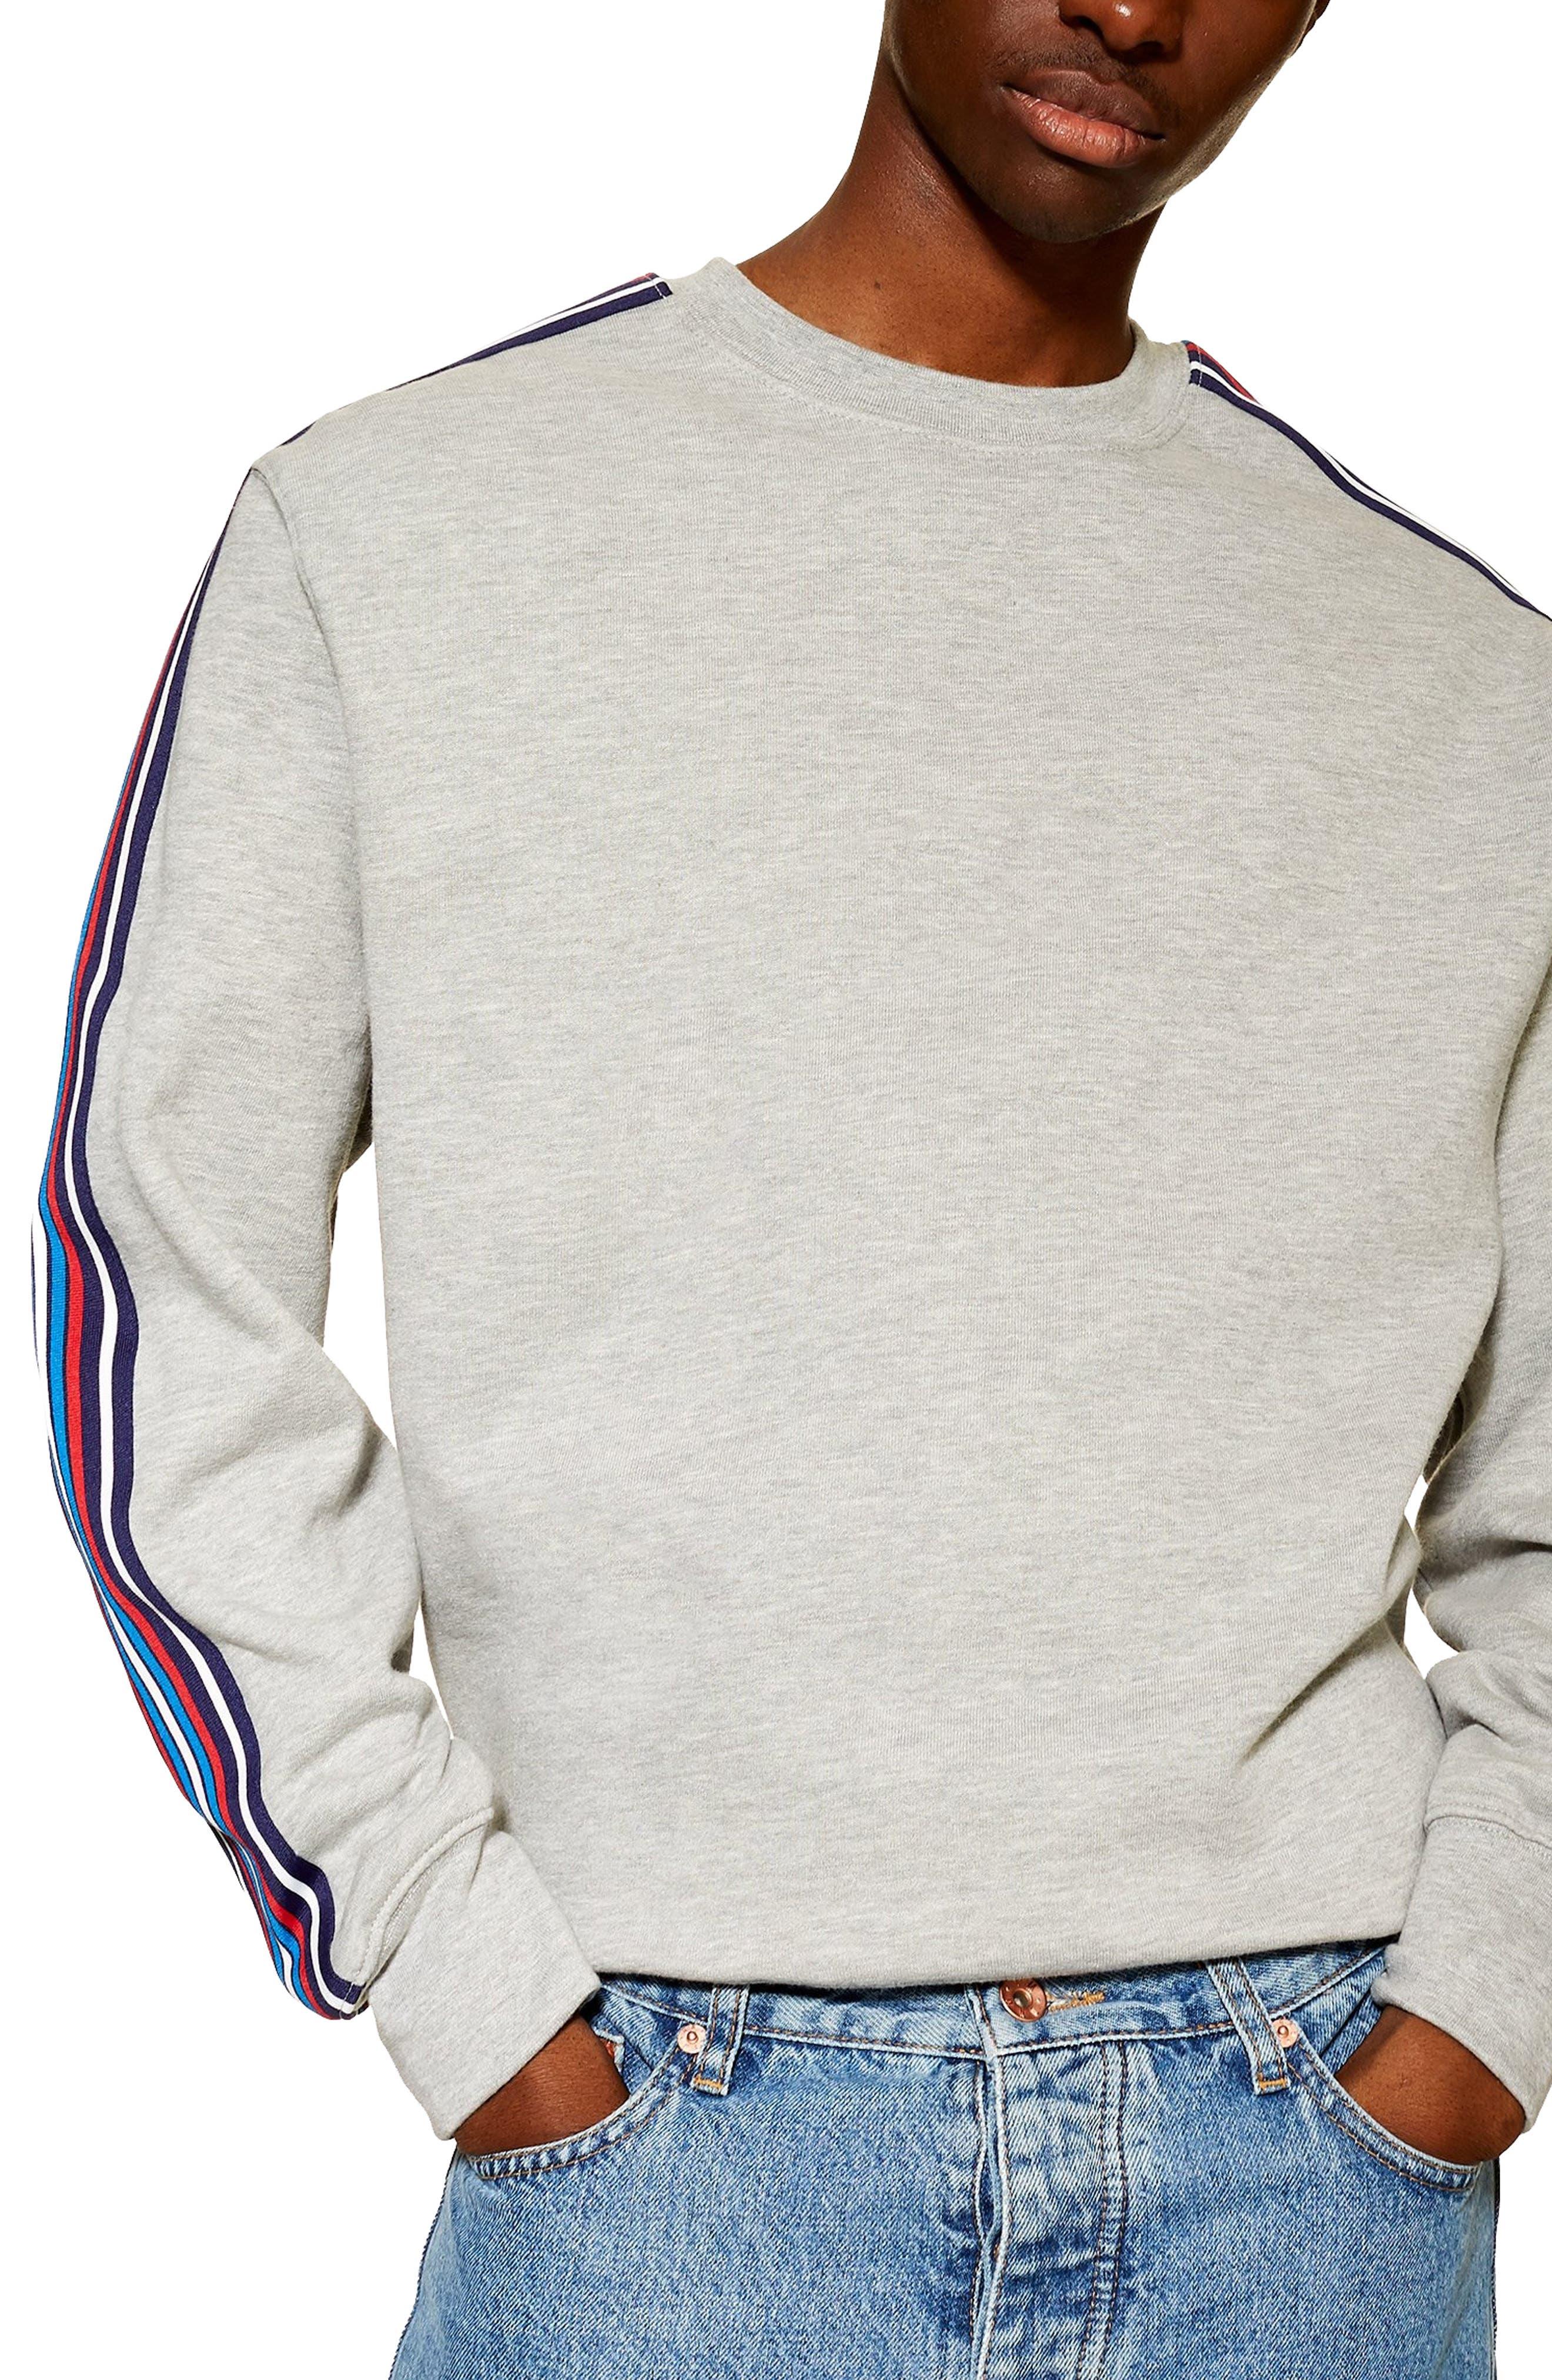 TOPMAN, Tape Crewneck Sweatshirt, Main thumbnail 1, color, LIGHT GREY